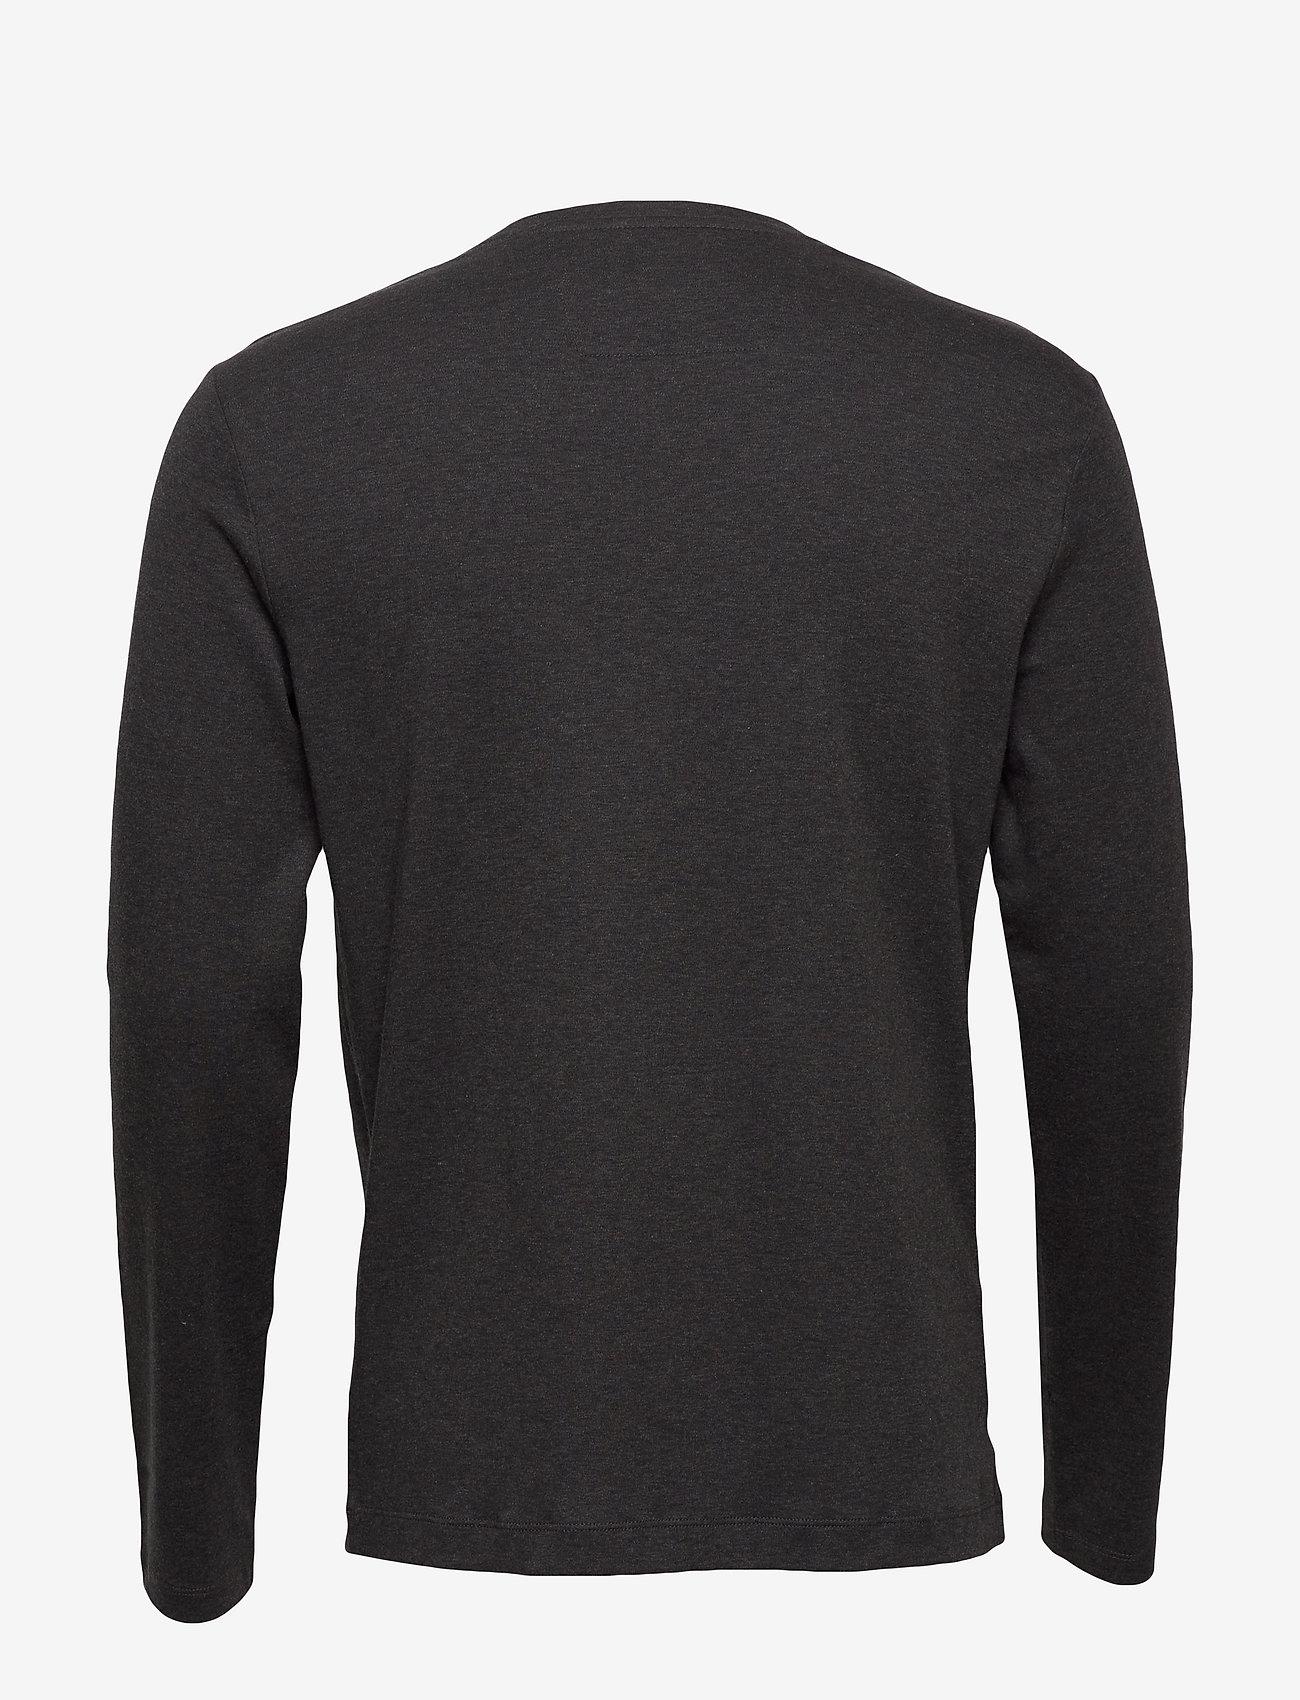 Banana Republic - Luxury-Touch Crew-Neck T-Shirt - basic t-shirts - dark charcoal - 1